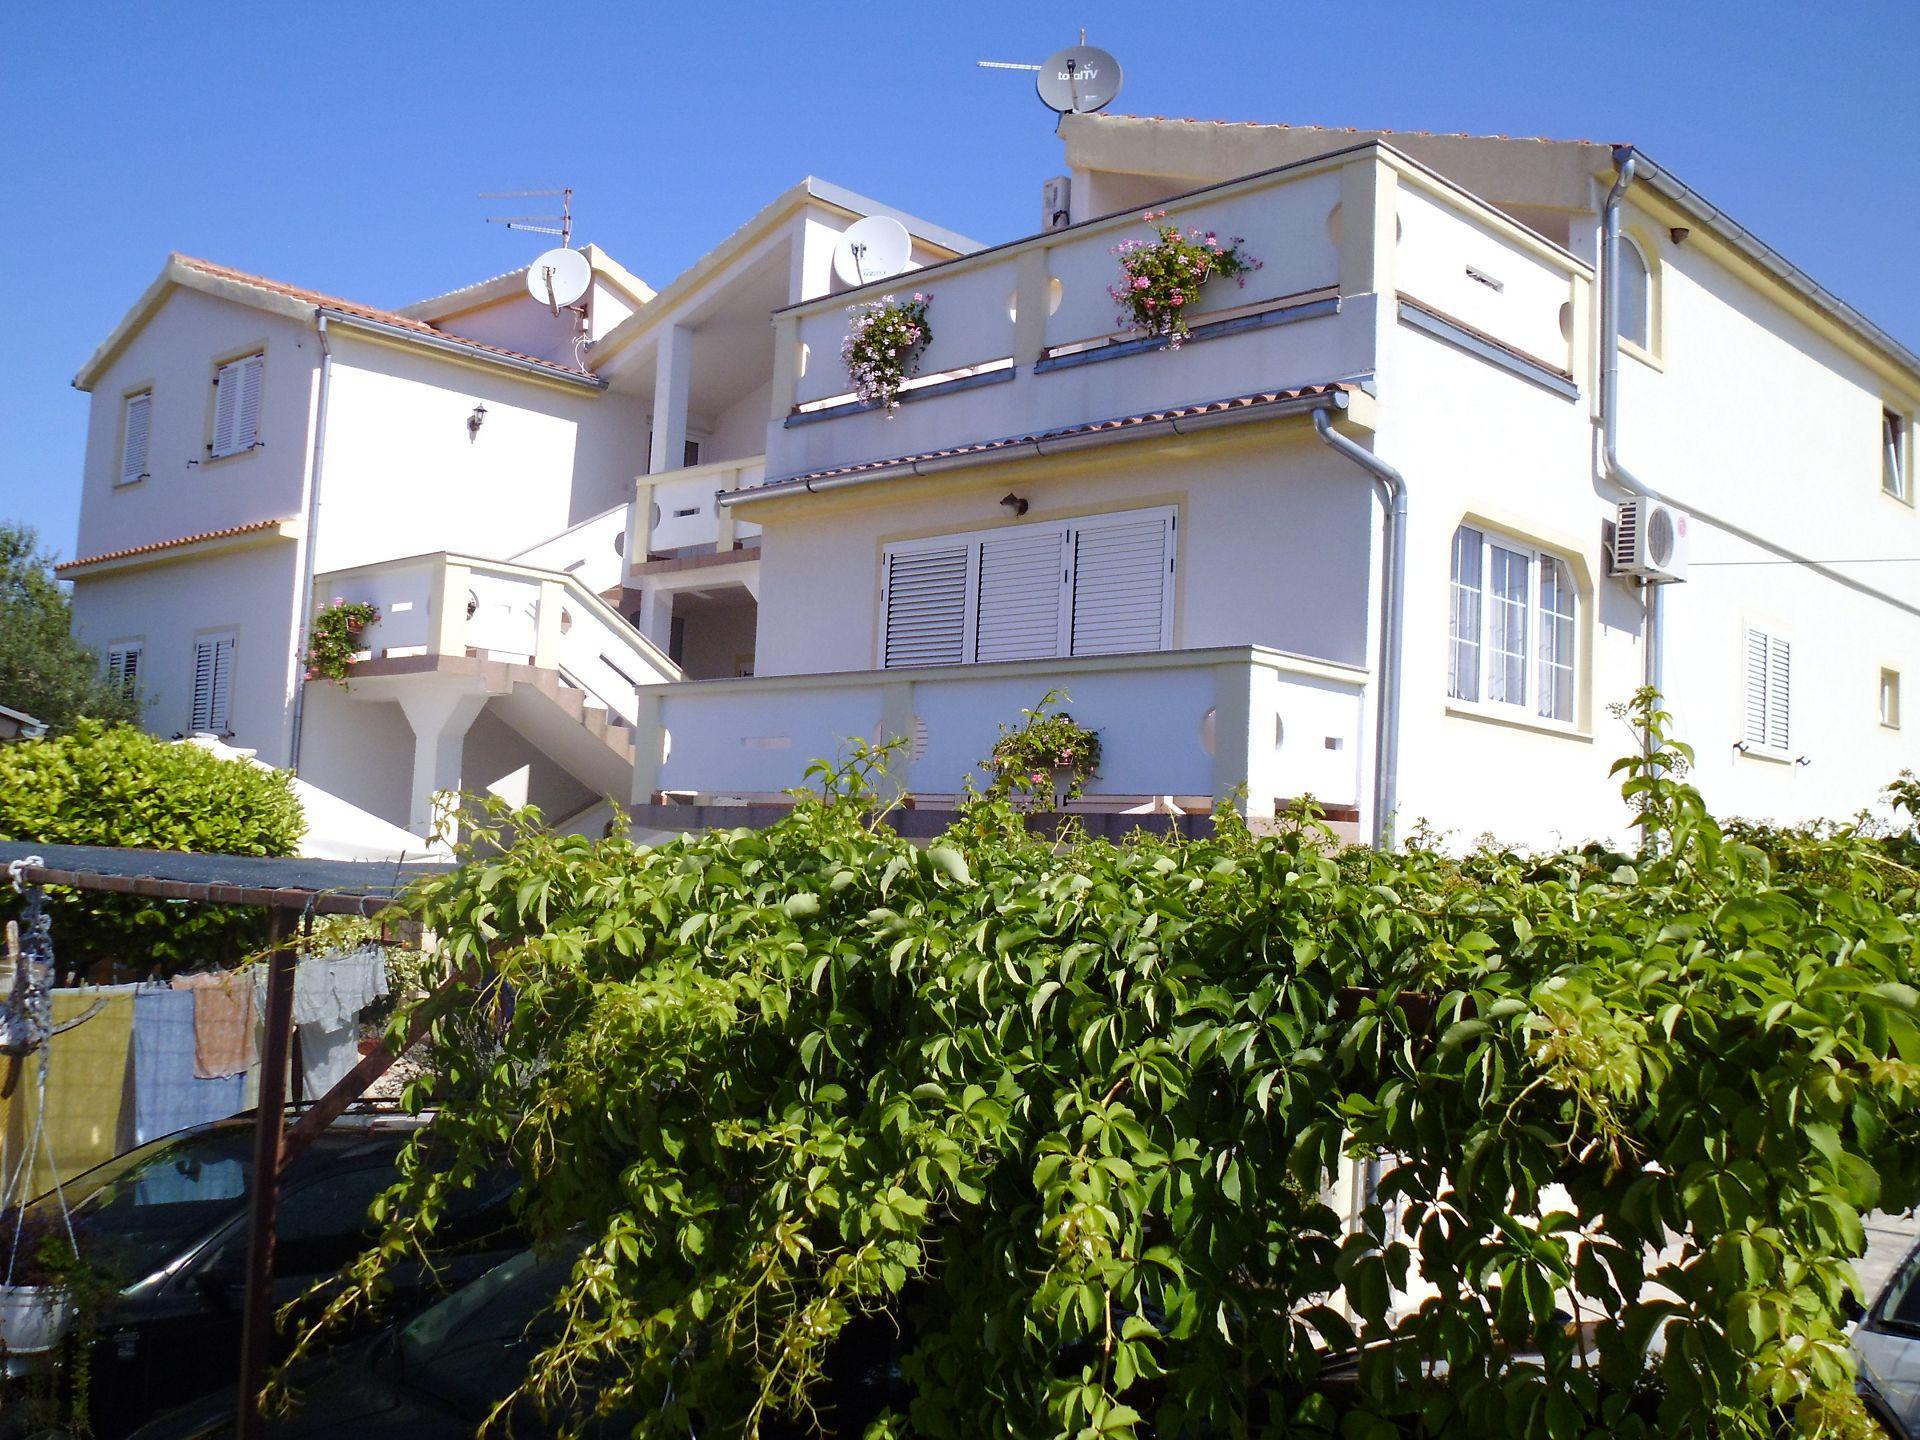 A00106PIRO - Pirovac - Appartamenti Croazia